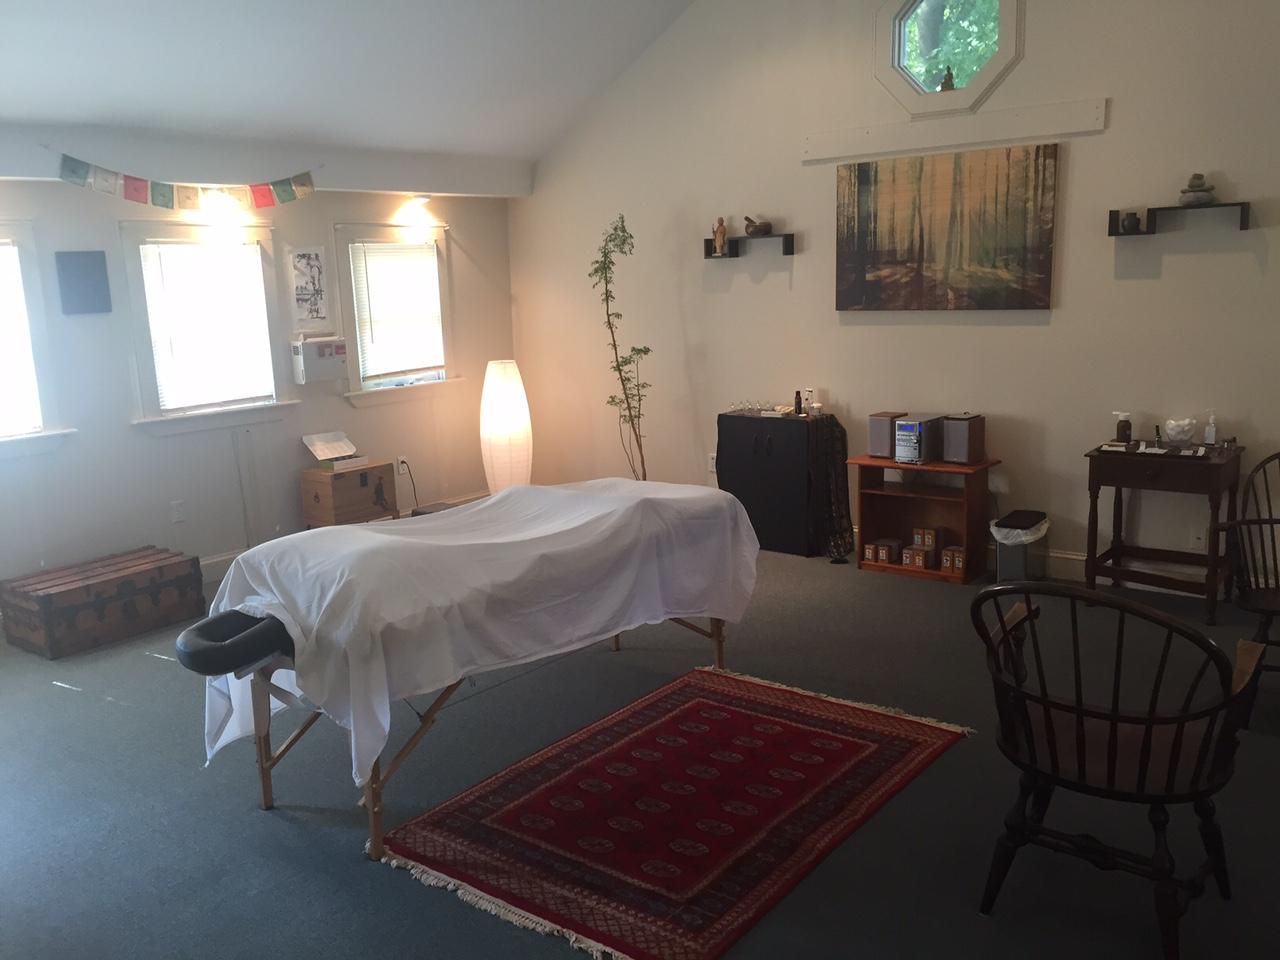 Gabe Schiff-Verre offers Acupuncture Portland Maine in Portland, Maine, Saint John Street